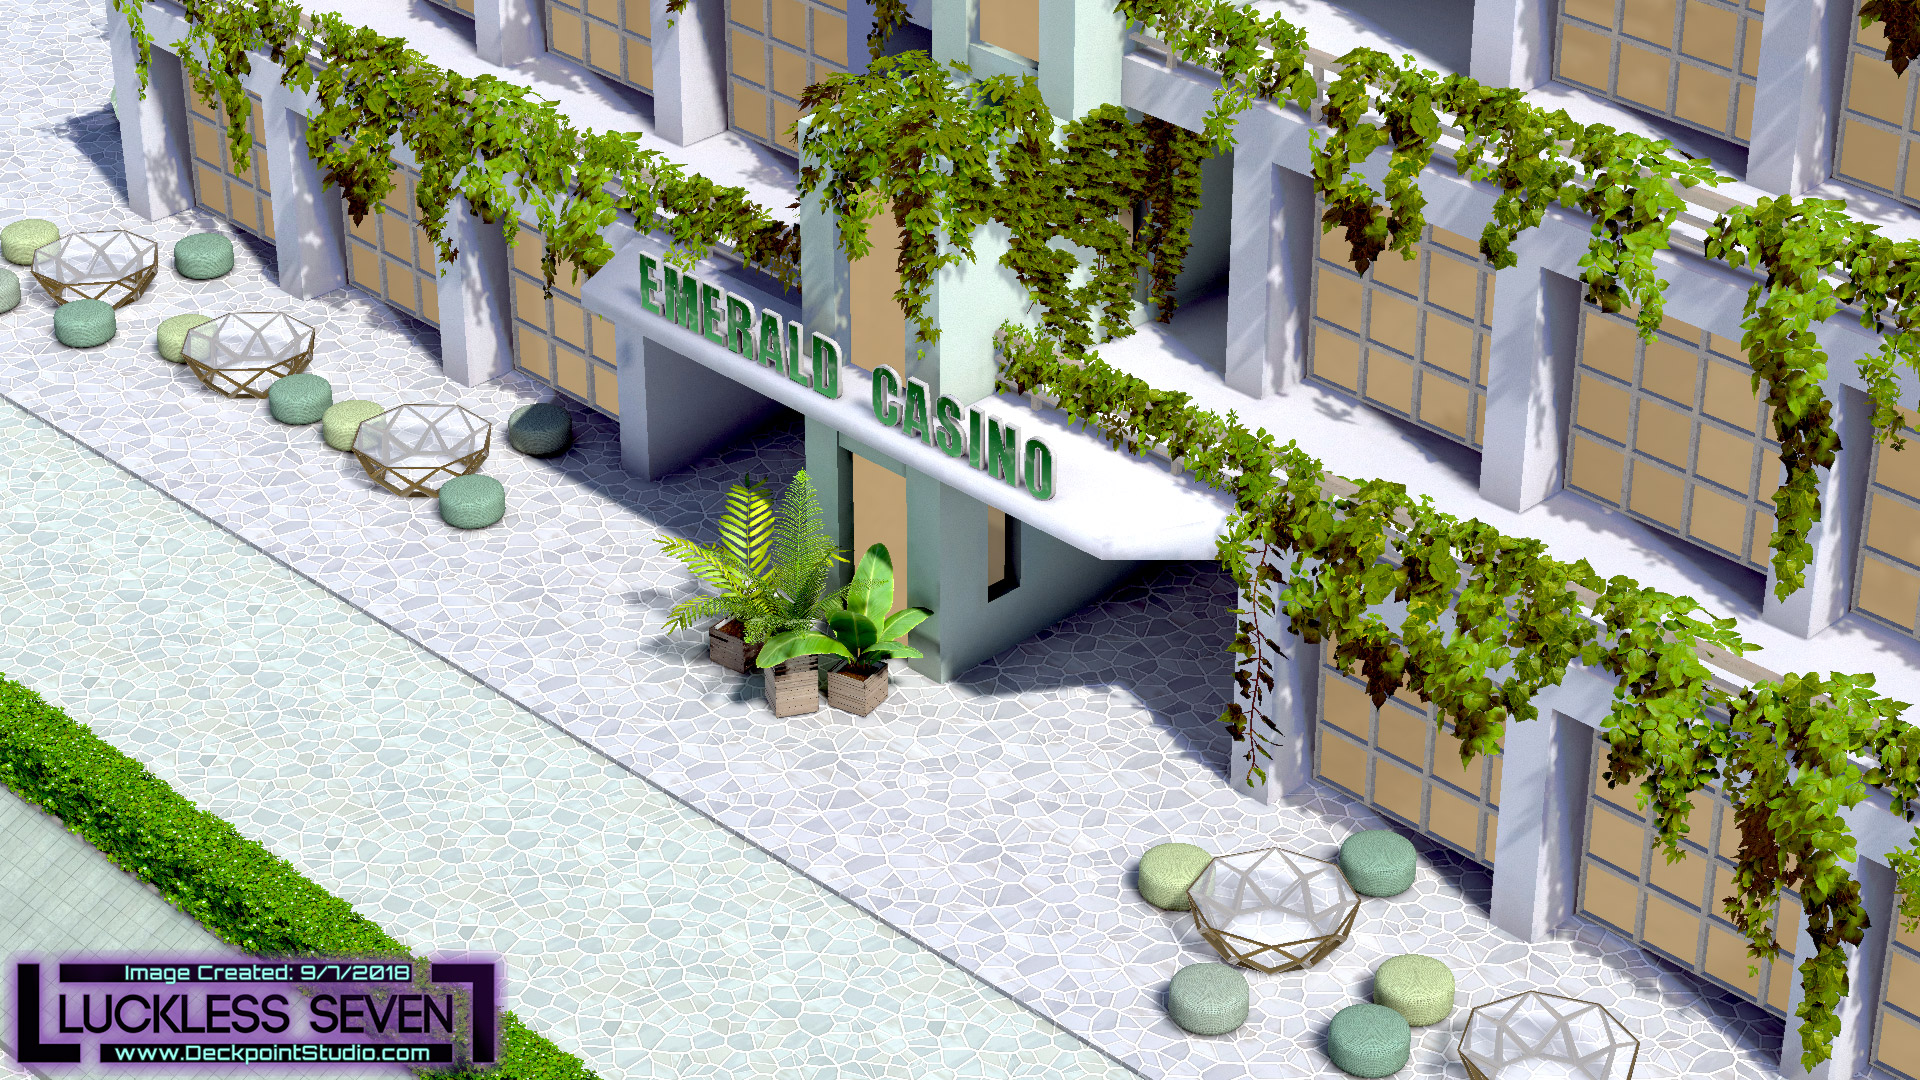 Emerald Casino Luckless Seven 2